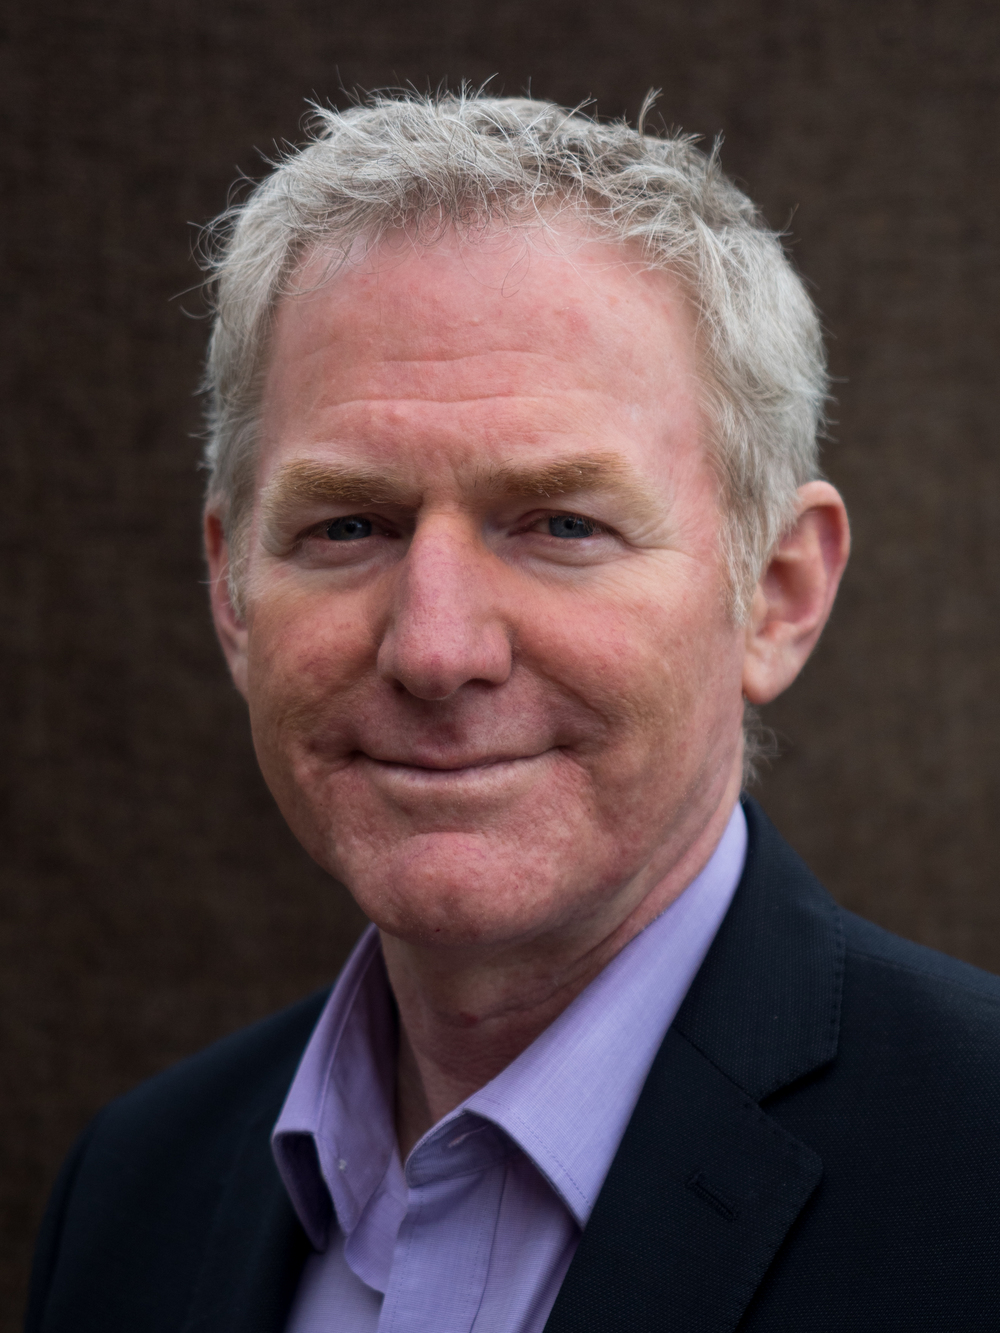 Sean Lowrie